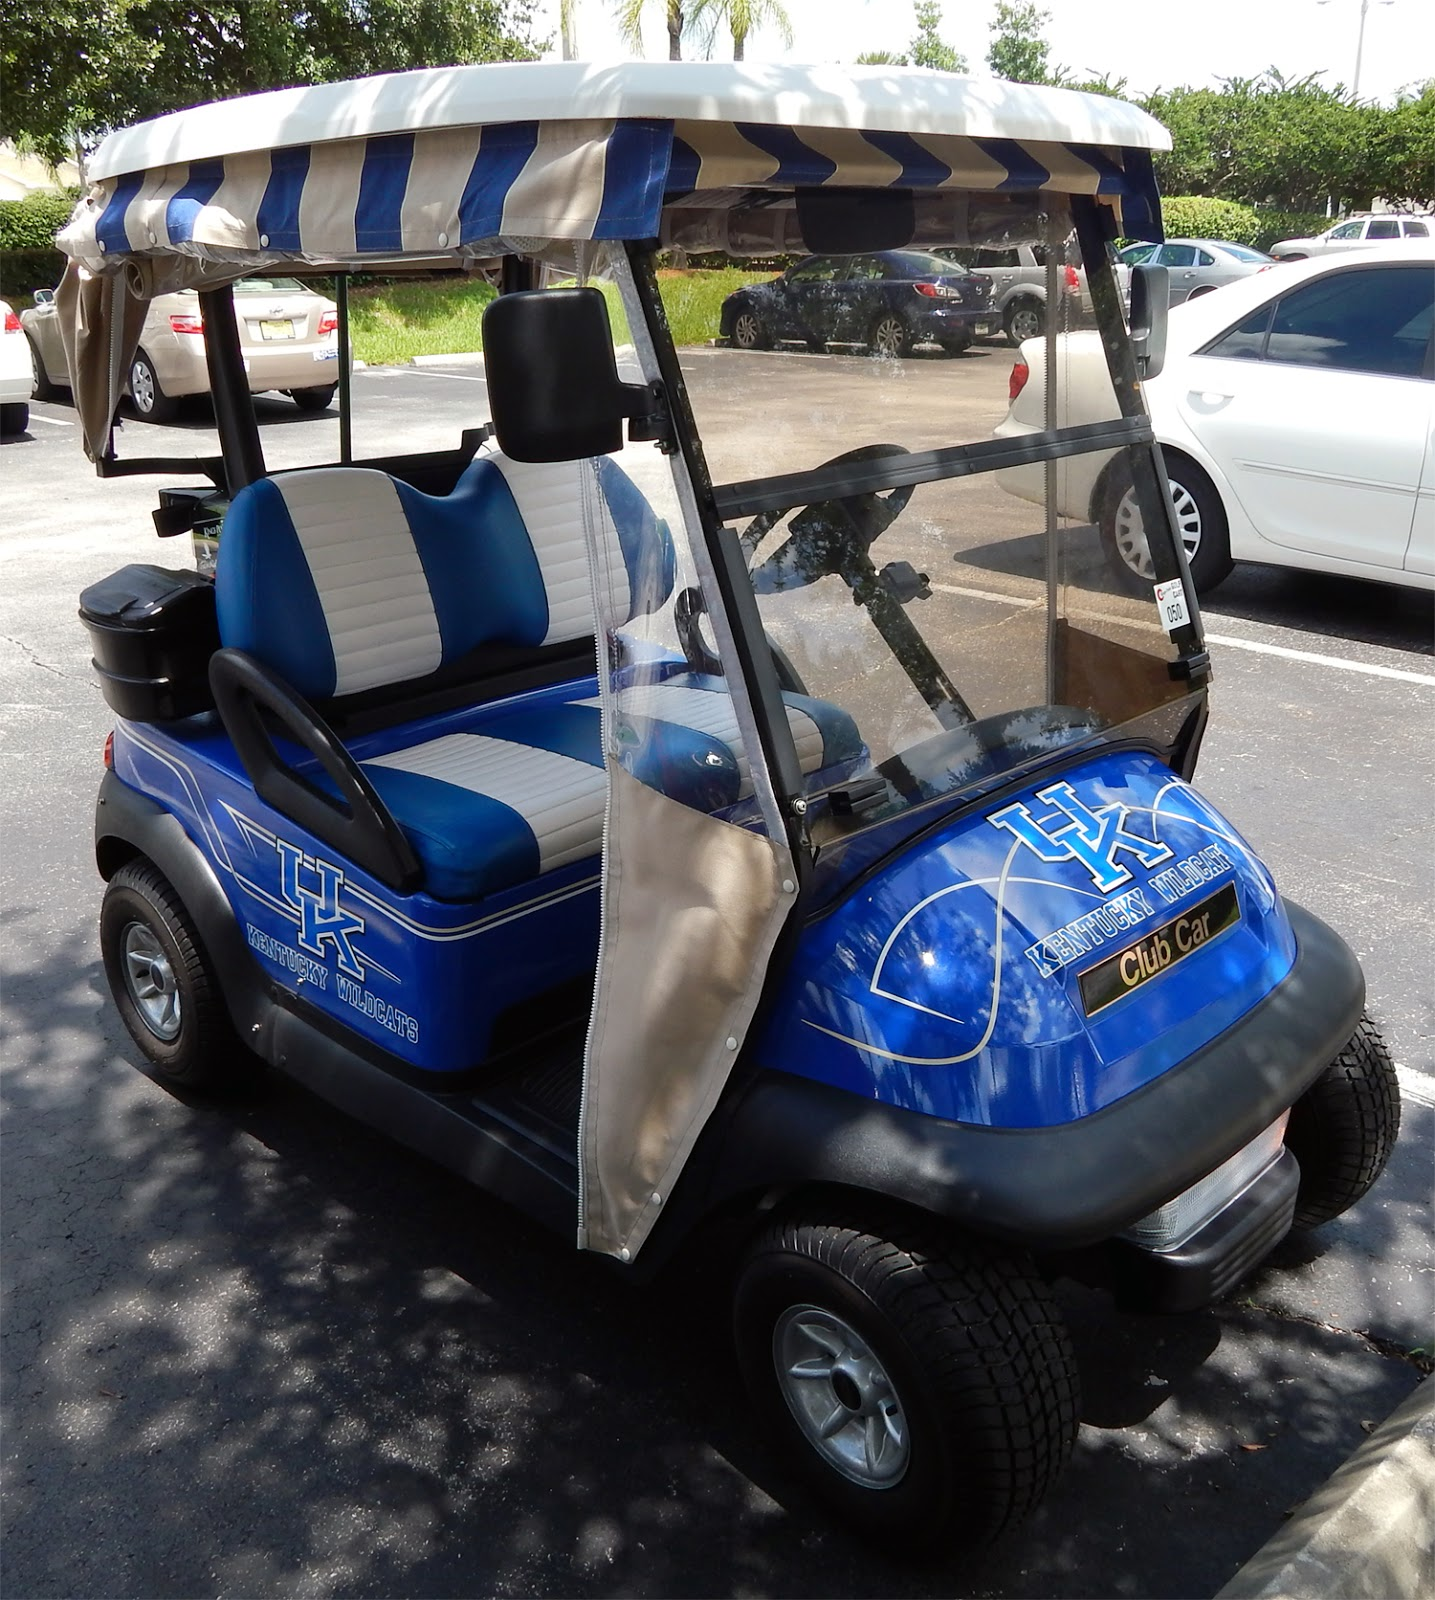 Custom Golf Carts Kentucky on street legal gas carts, la custom carts, cushman carts, used carts, dough boyz custom carts, custom cars, custom golf racks, custom utvs, big o custom carts, custom wheels, cricket 4 wheel carts, custom atvs, custom work carts, custom club cart, lsv carts, ez go flatbed carts, east coast custom carts, ezgo carts, king of carts, custom electric cart,